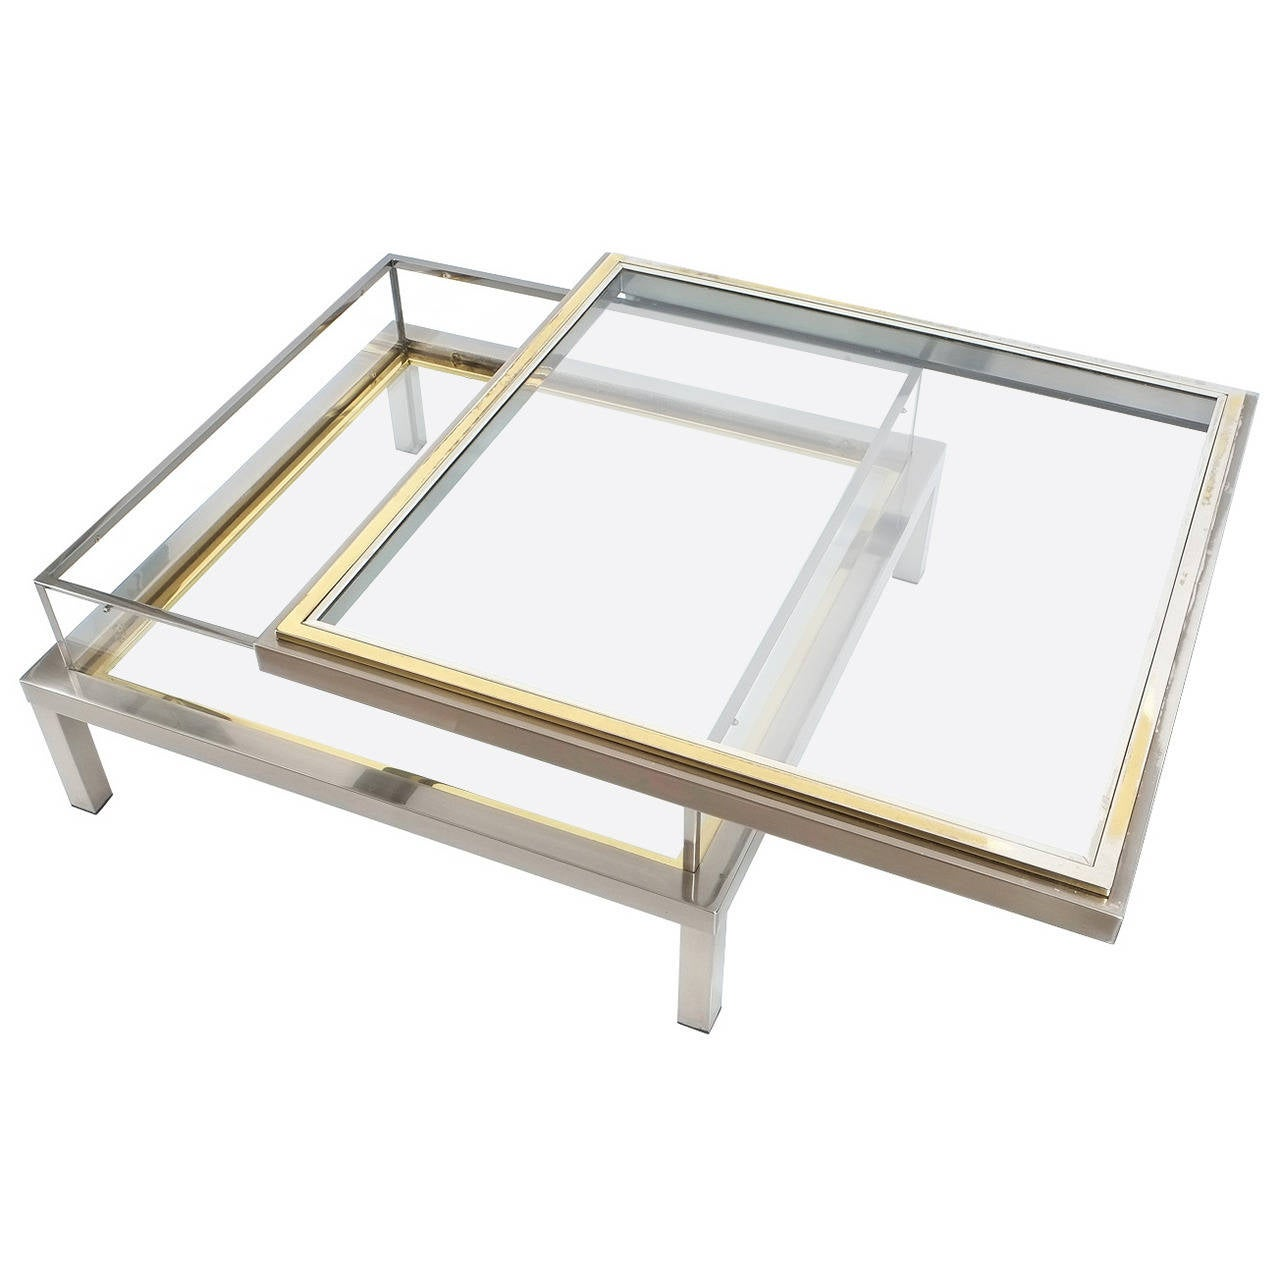 Elegant romeo rega brass and chrome coffee table with interior elegant romeo rega brass and chrome coffee table with interior display 1 geotapseo Images